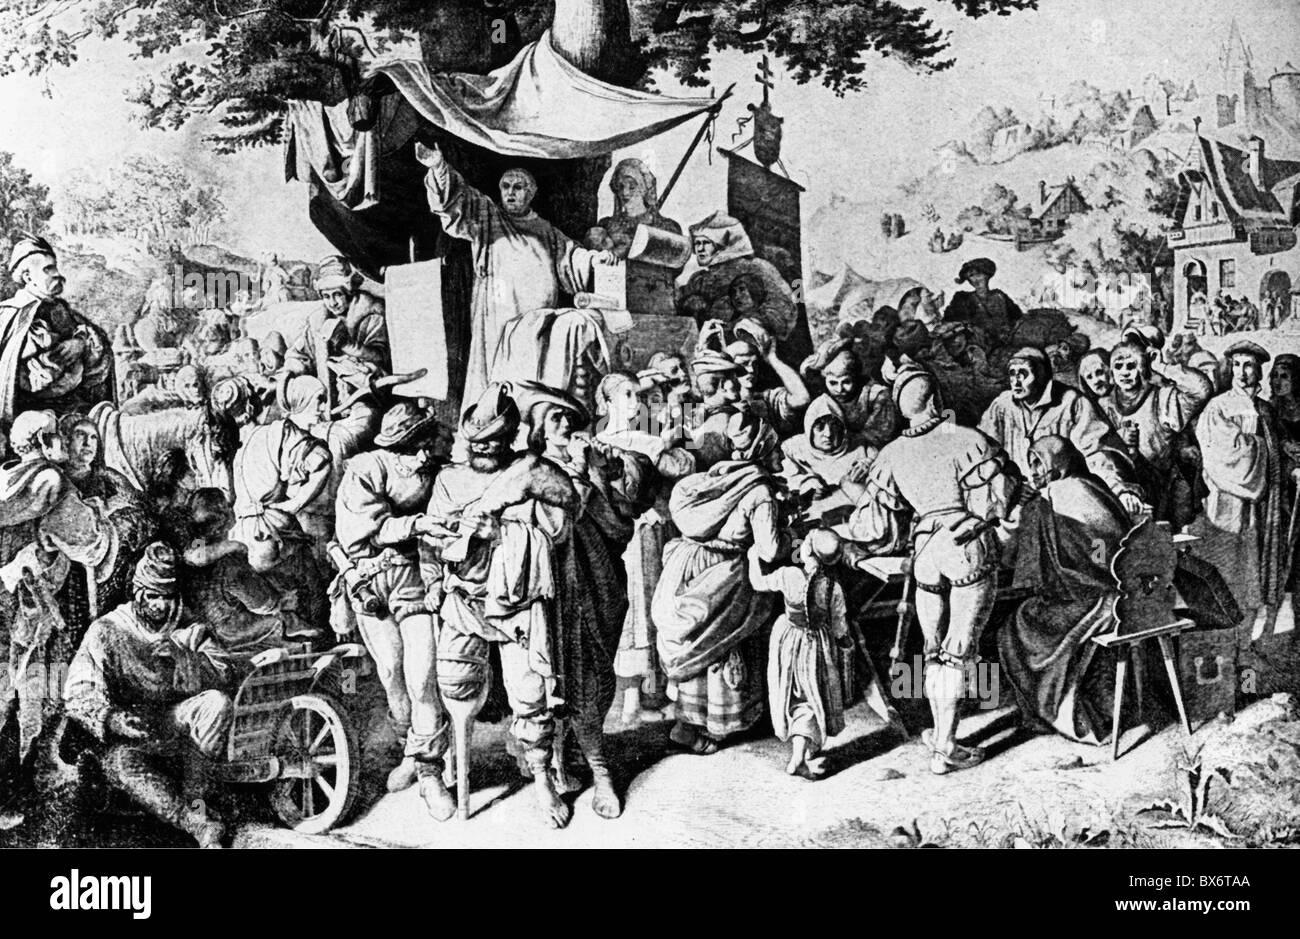 Tetzel, Johann, circa 1465 - 11.8.1519, German Dominicain preacher, pardoner, scene, selling indulgences, illustration - Stock Image